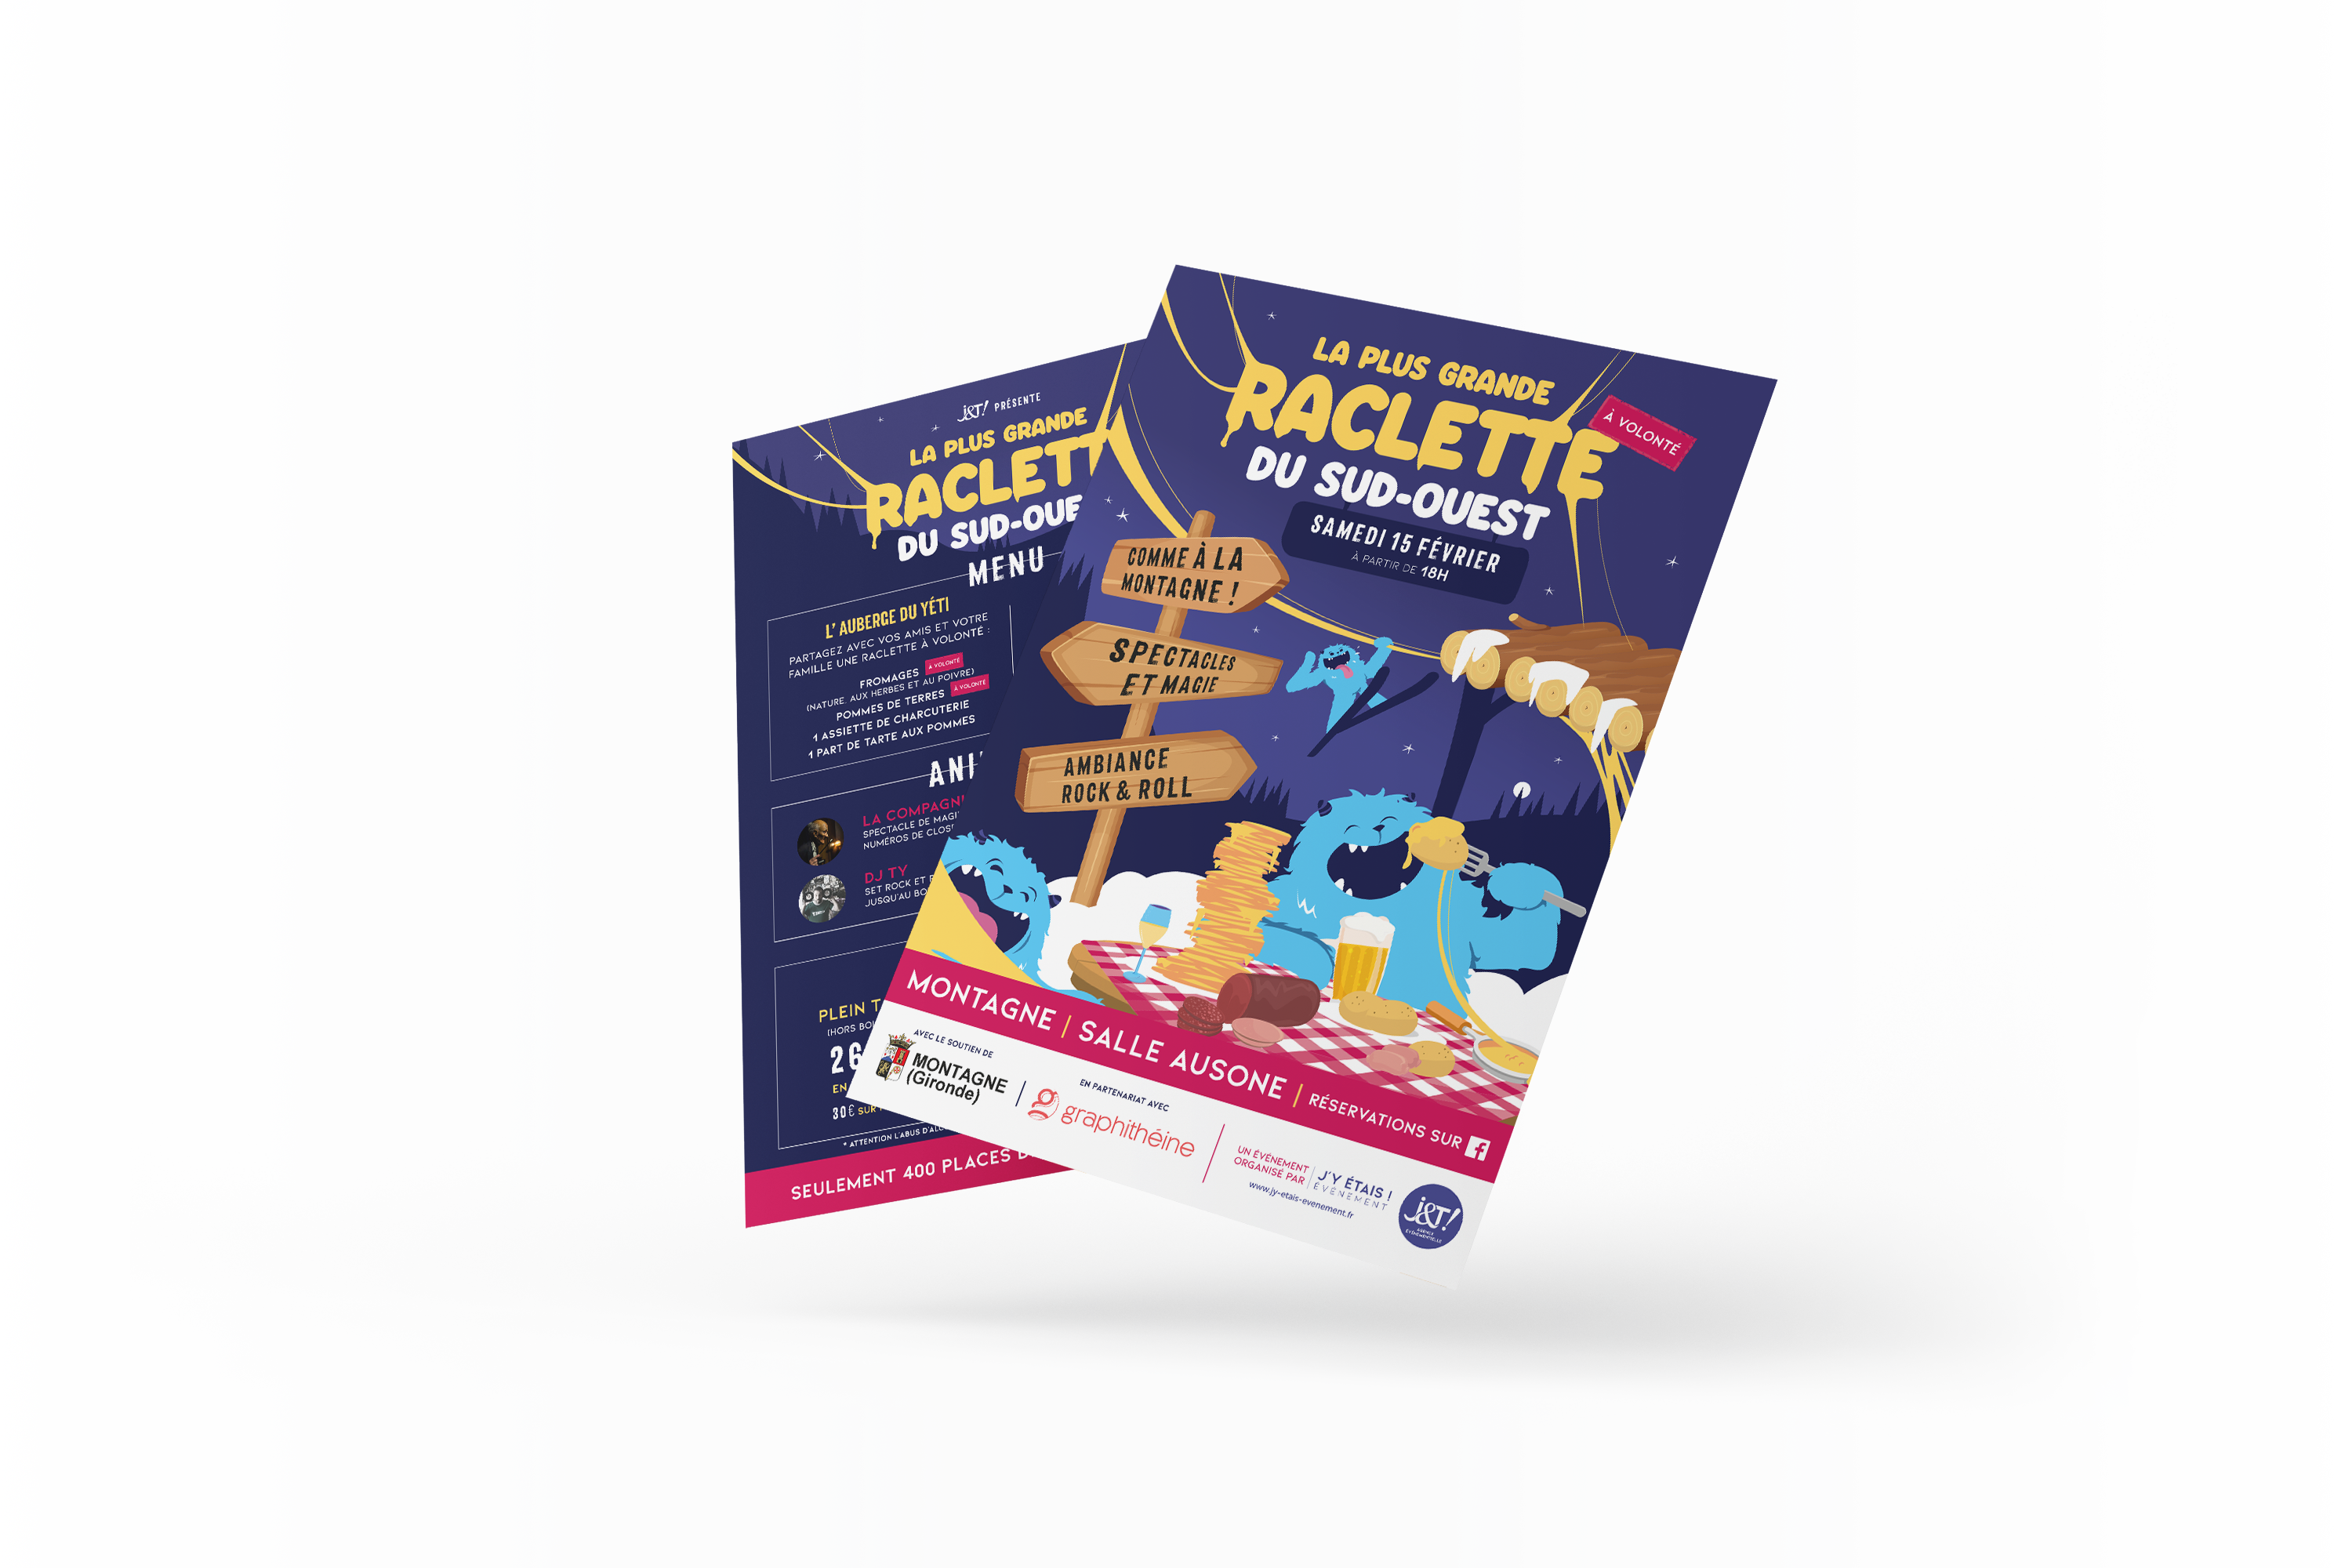 flyer-plus-grande-raclette-sud-ouest-print-supports-imprimes